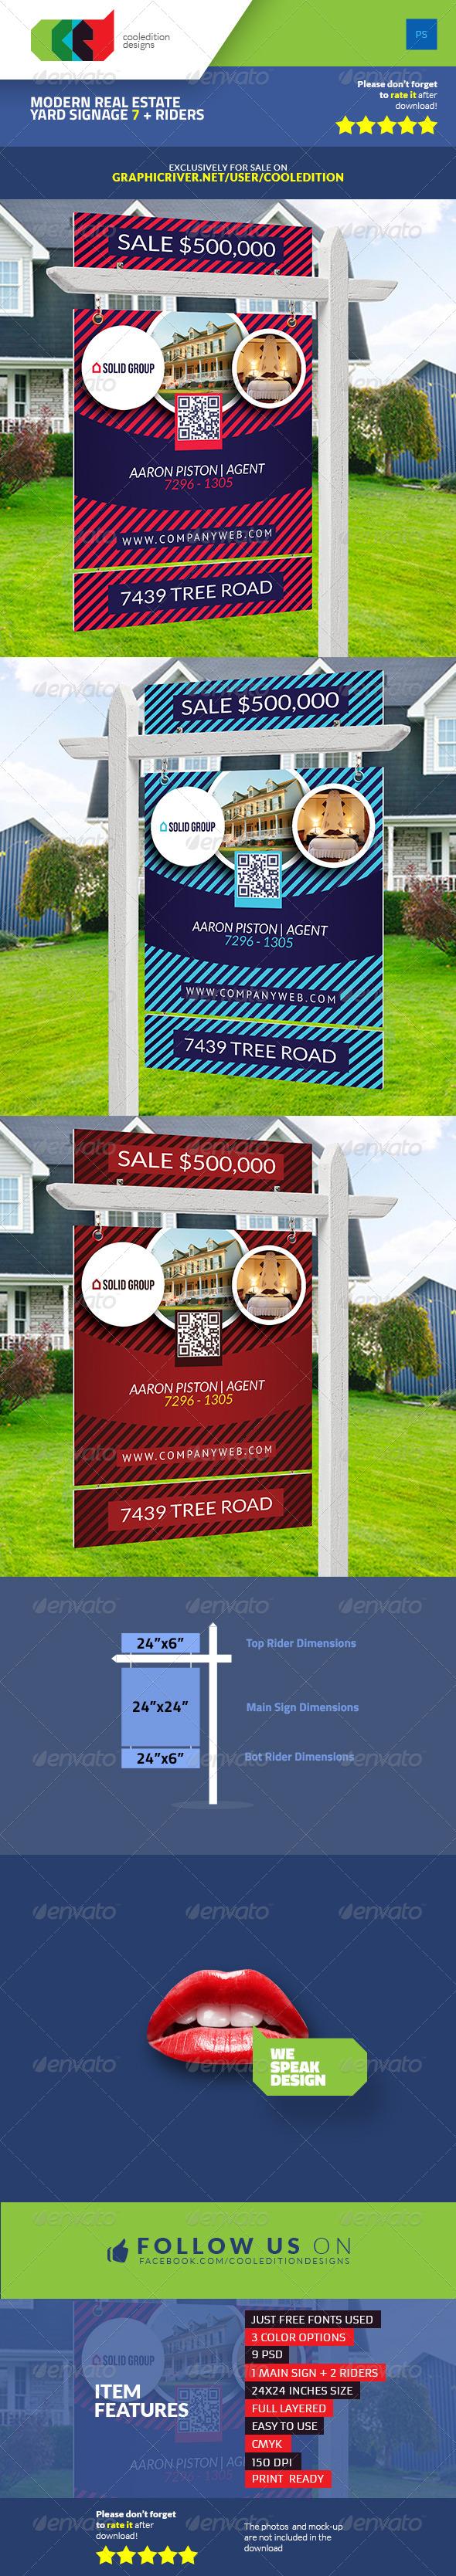 Modern Real Estate Yard Signage 7 & Riders